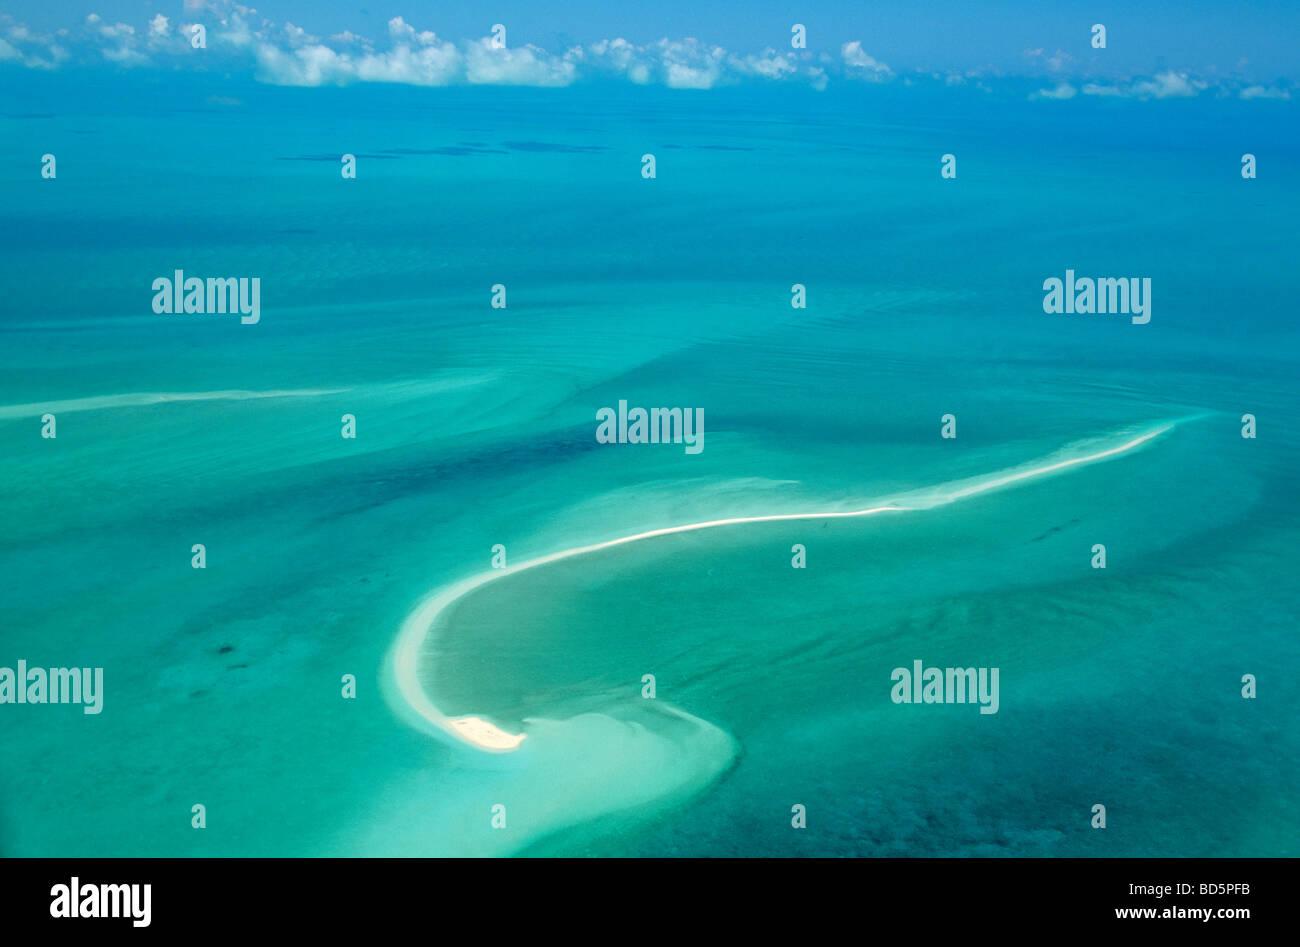 Sandbar in shallow seas of Grand Bahama Bank aerial view north of Exuma in the Bahama Islands BEAN AL Pix 0114 - Stock Image